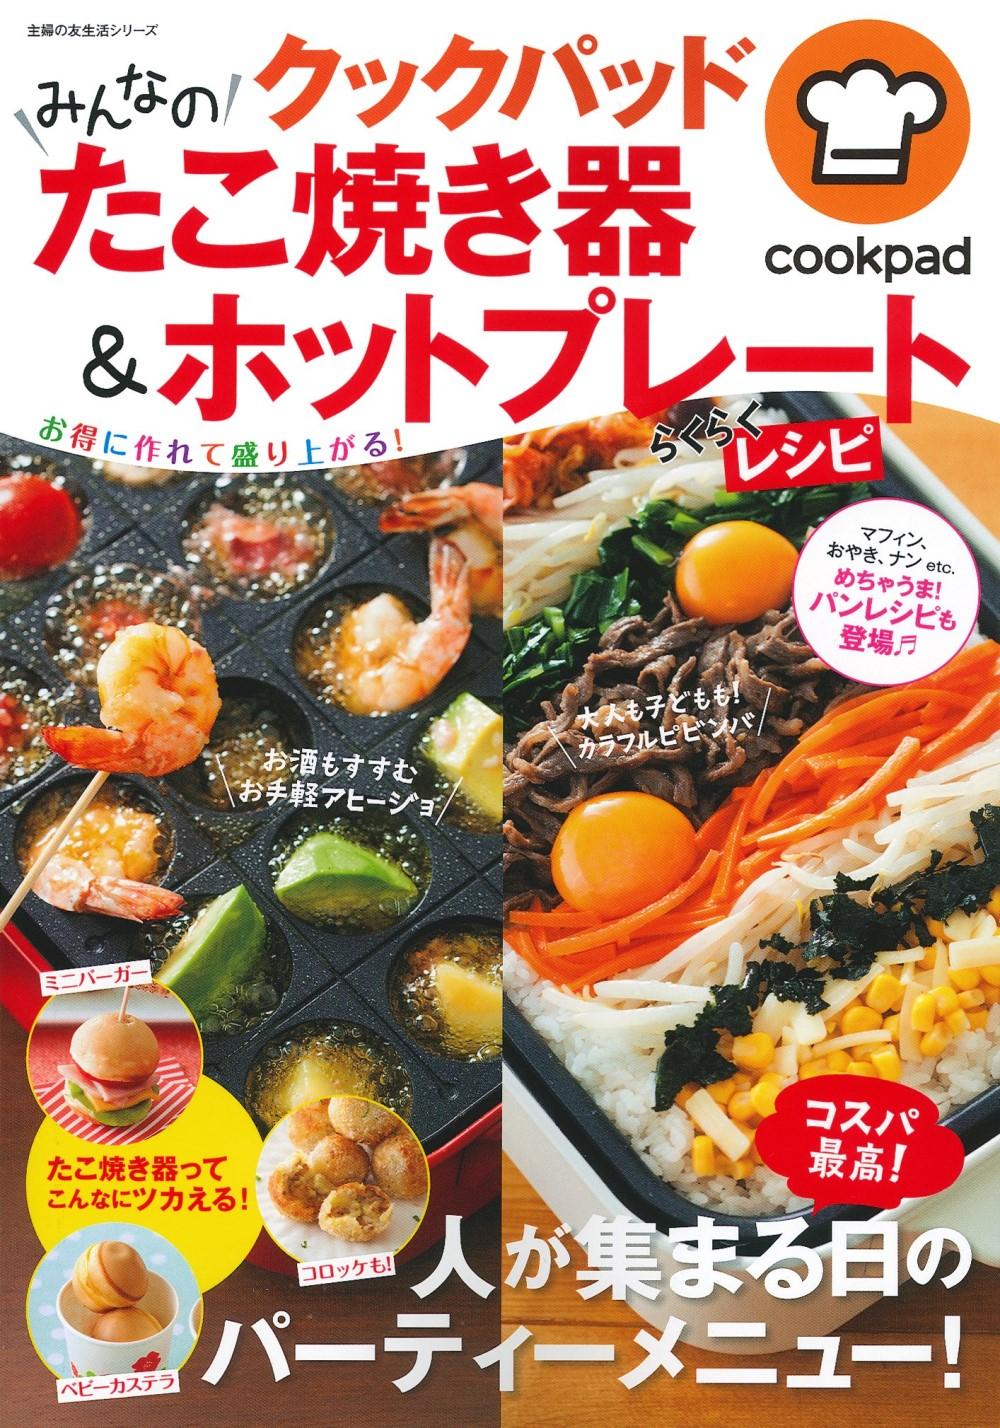 COOKPAD章魚燒器與HOTPLATE鐵板料理食譜集